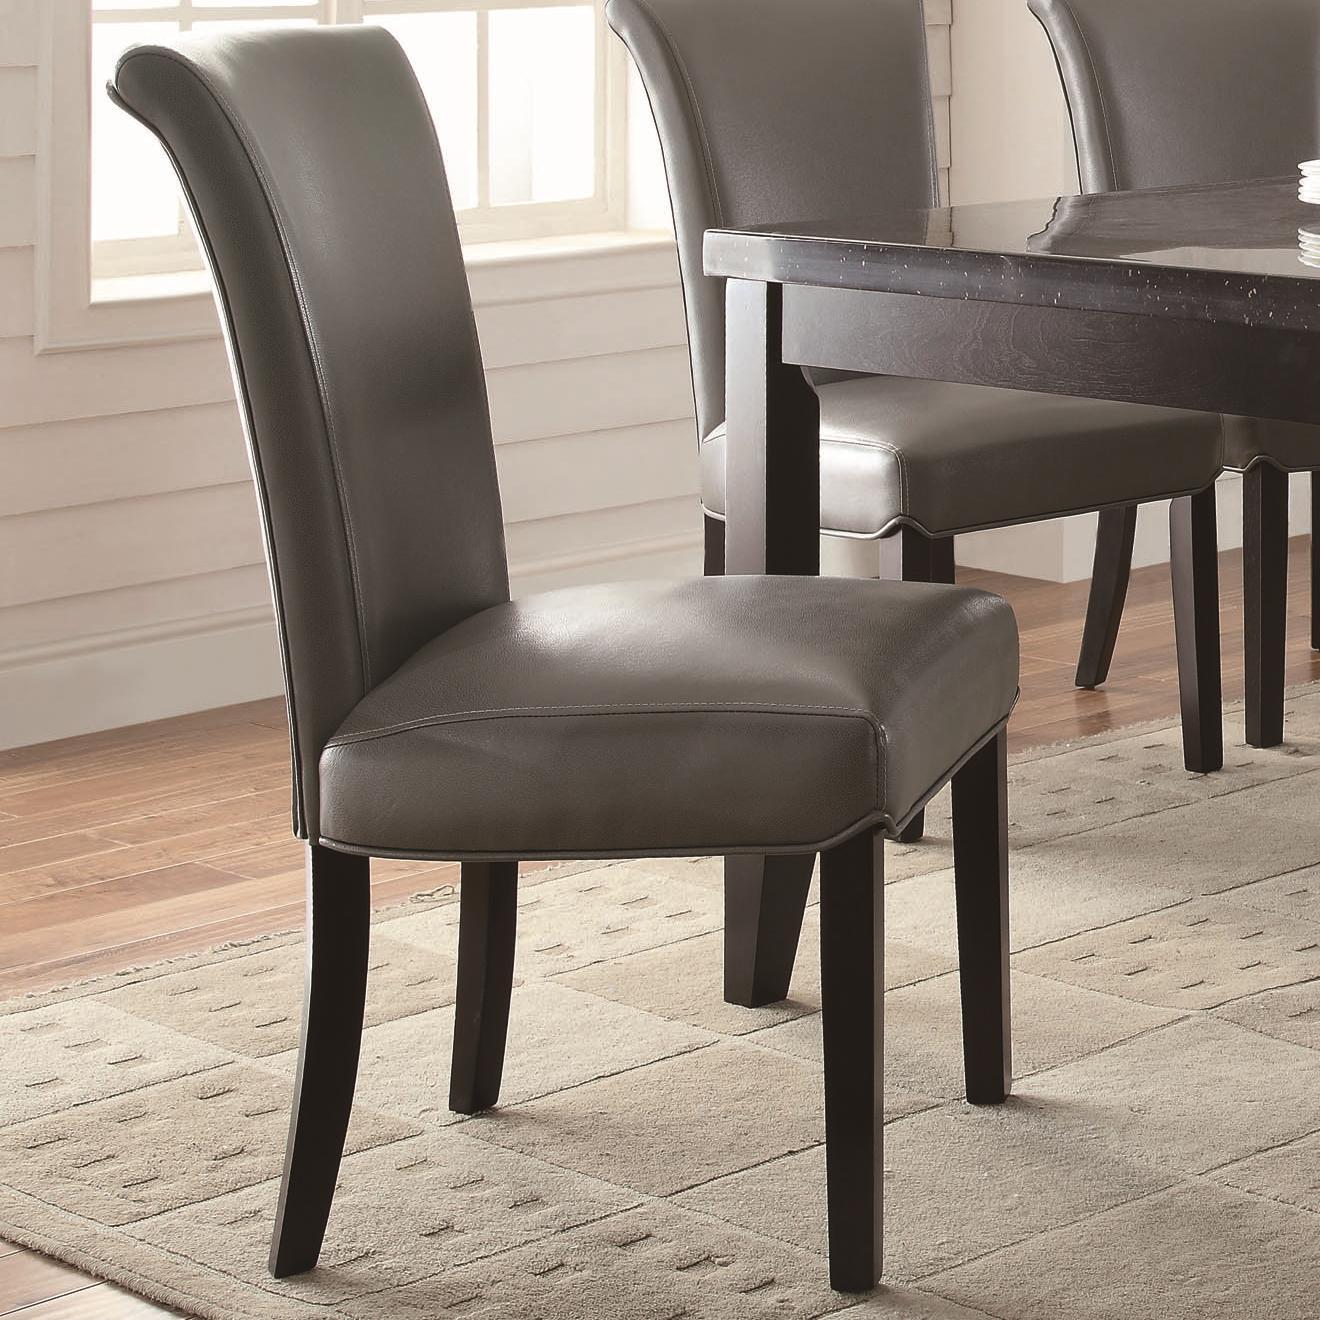 Coaster Newbridge Upholstered Metal Chair - Item Number: 102882